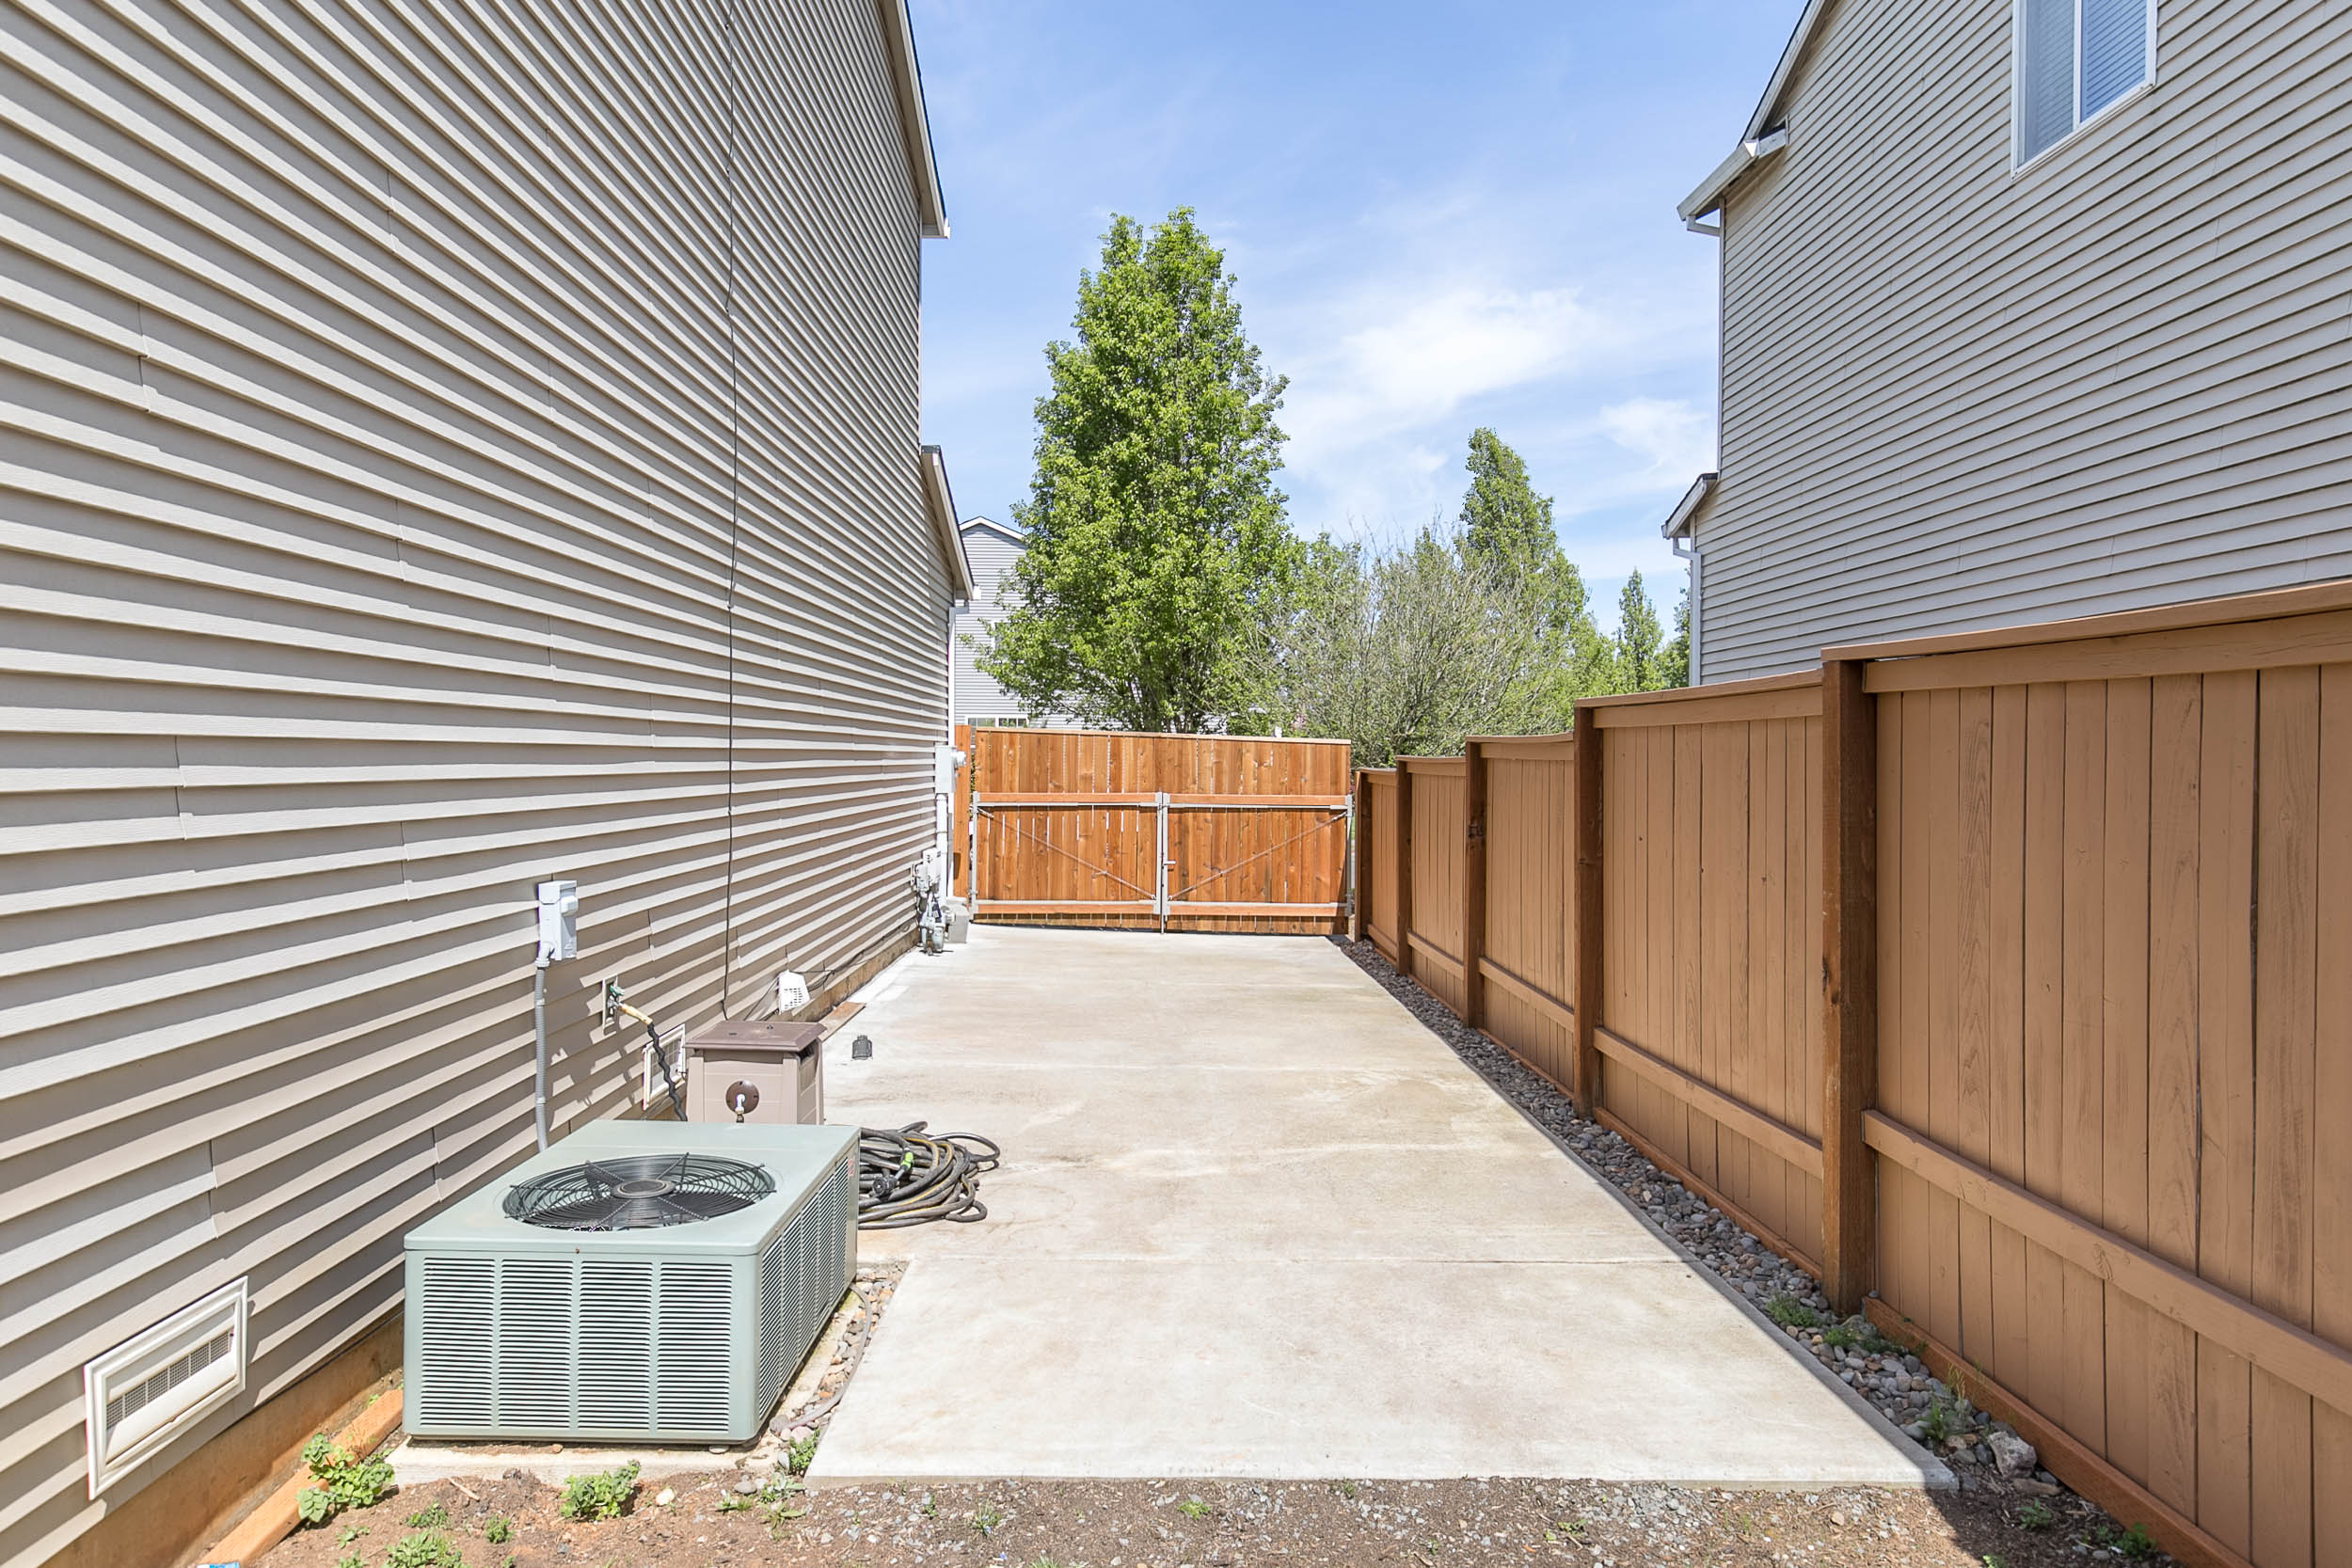 044_14372 Talawa Dr., Oregon City_MG_8043-HDR.jpg